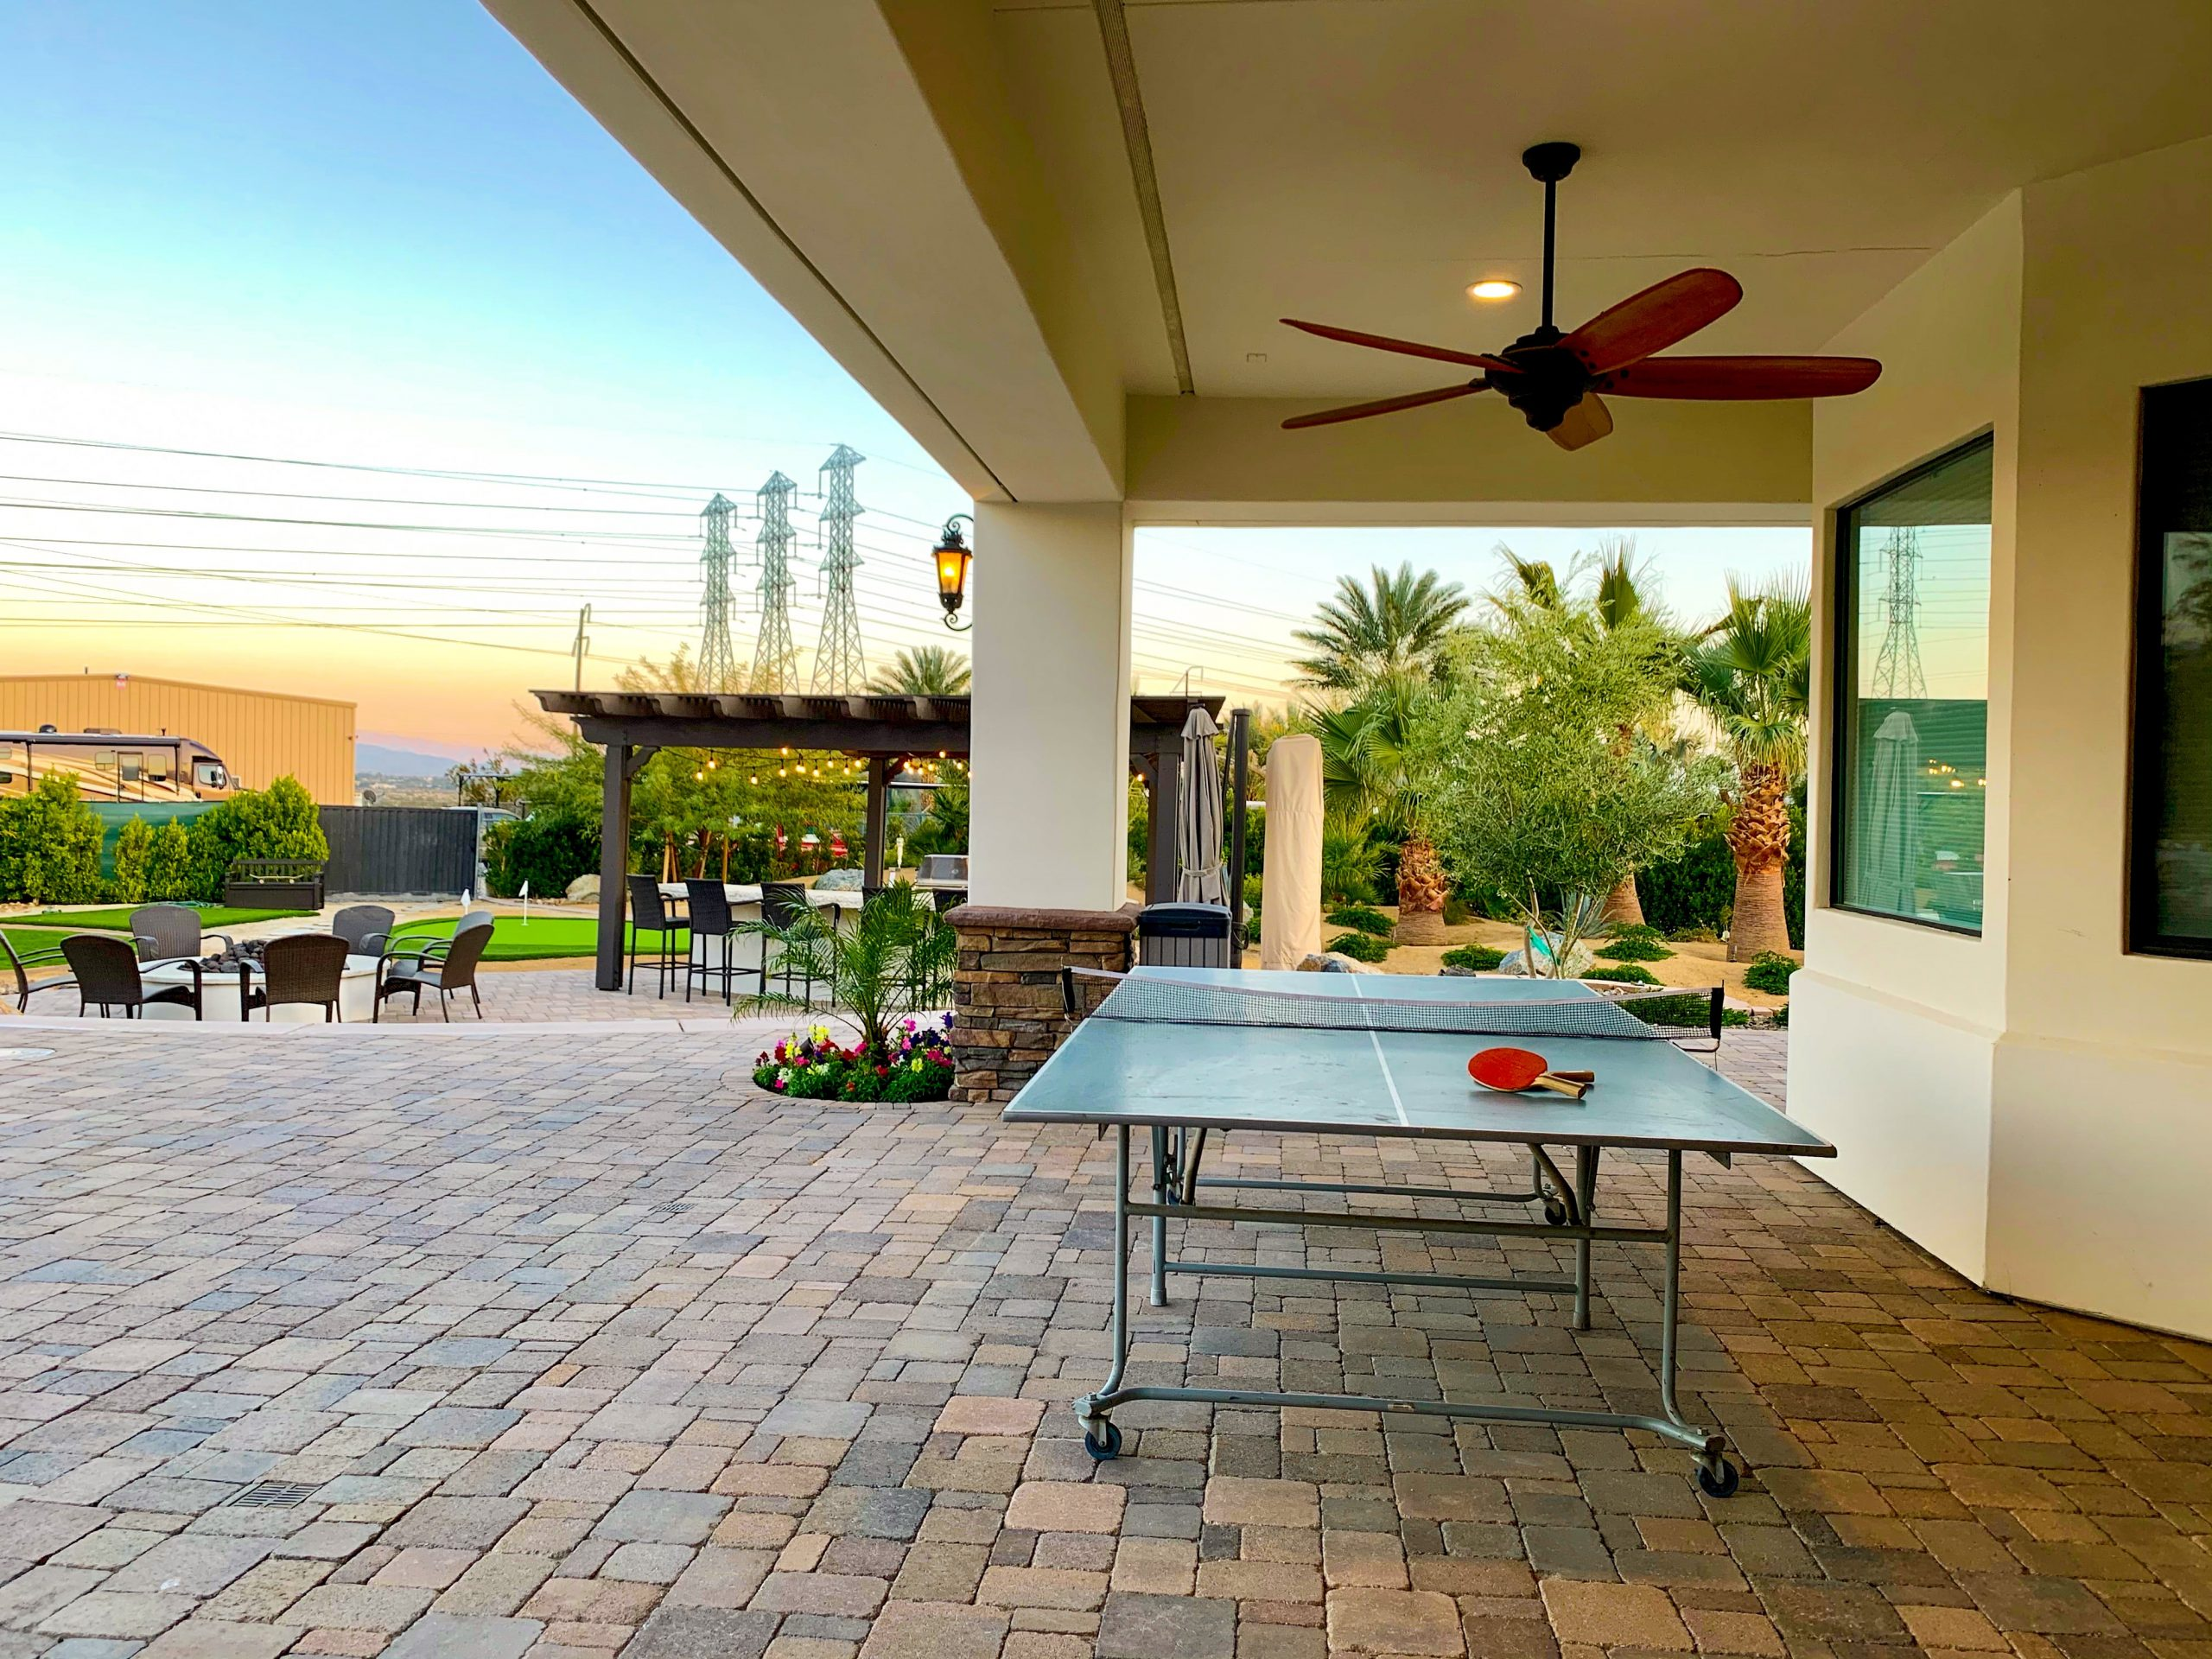 The Estate at Via Las Palmas - Back Patio and Ping Pong Table